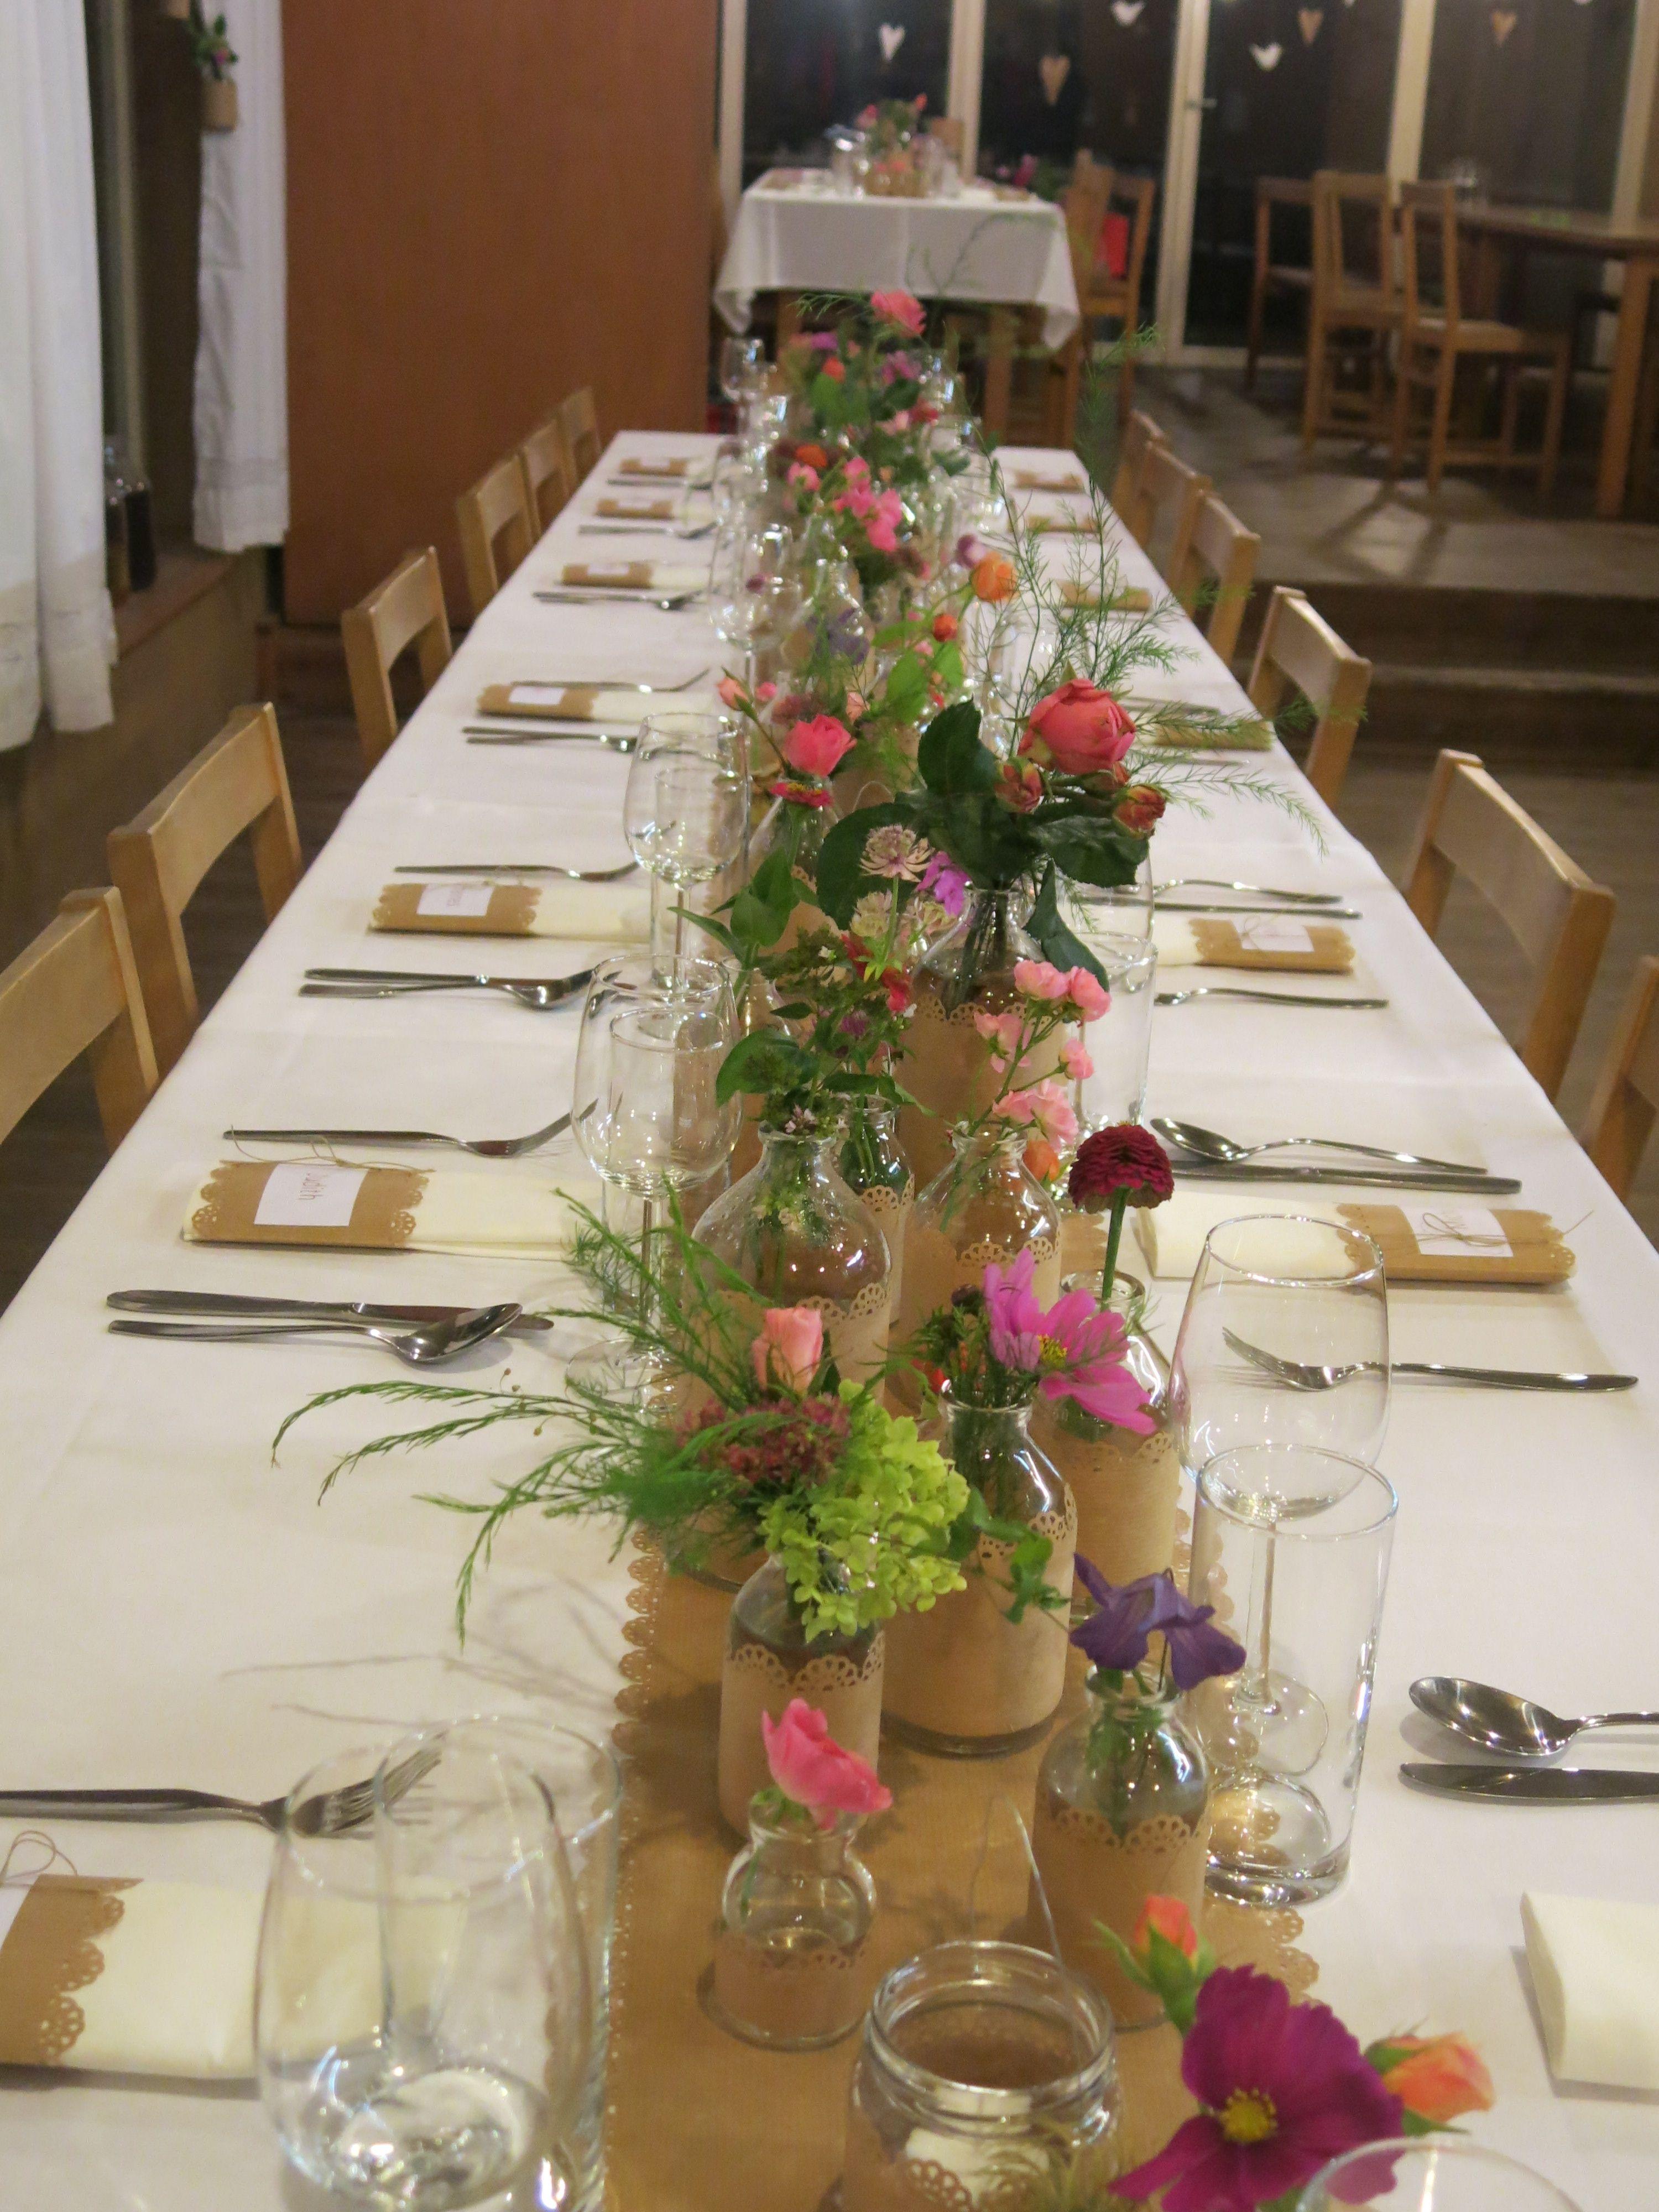 tischdeko DIY kraftpapier wiesenblumen  Deko Geburtstag